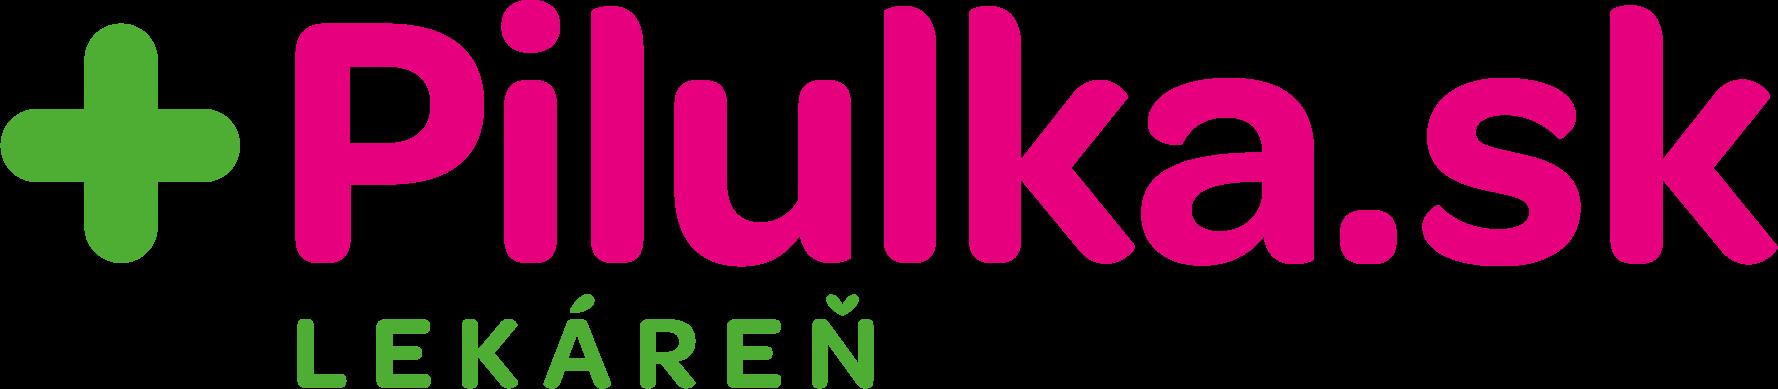 pilulka-logo